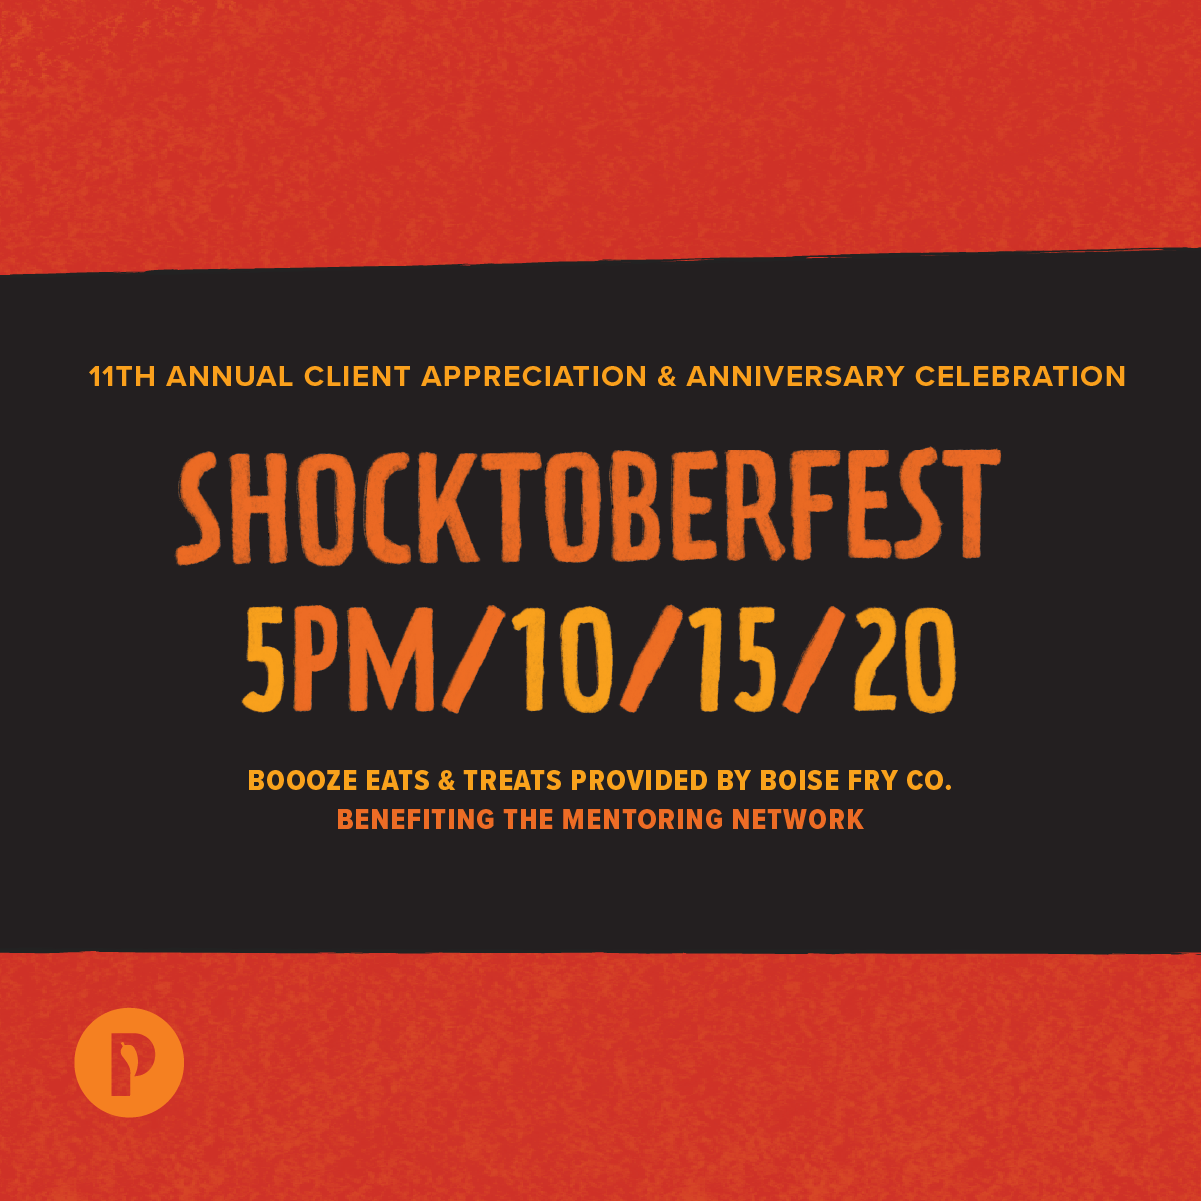 PPSK_2020_Shocktoberfest_Post